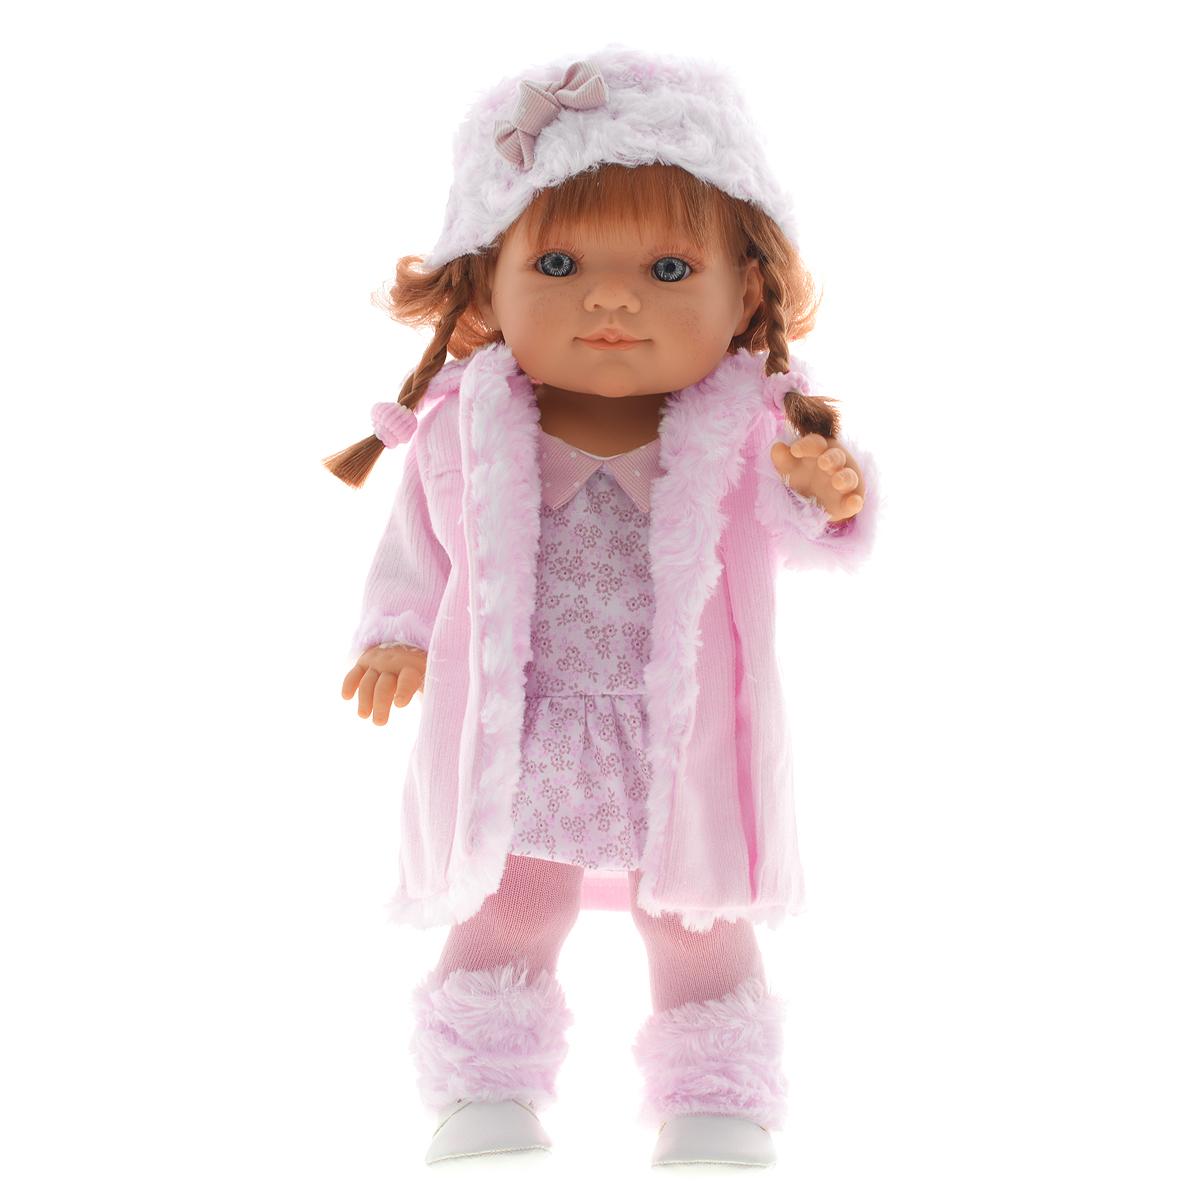 Кукла Antonio Juan Фермина, 38 см белые женские ботиночки